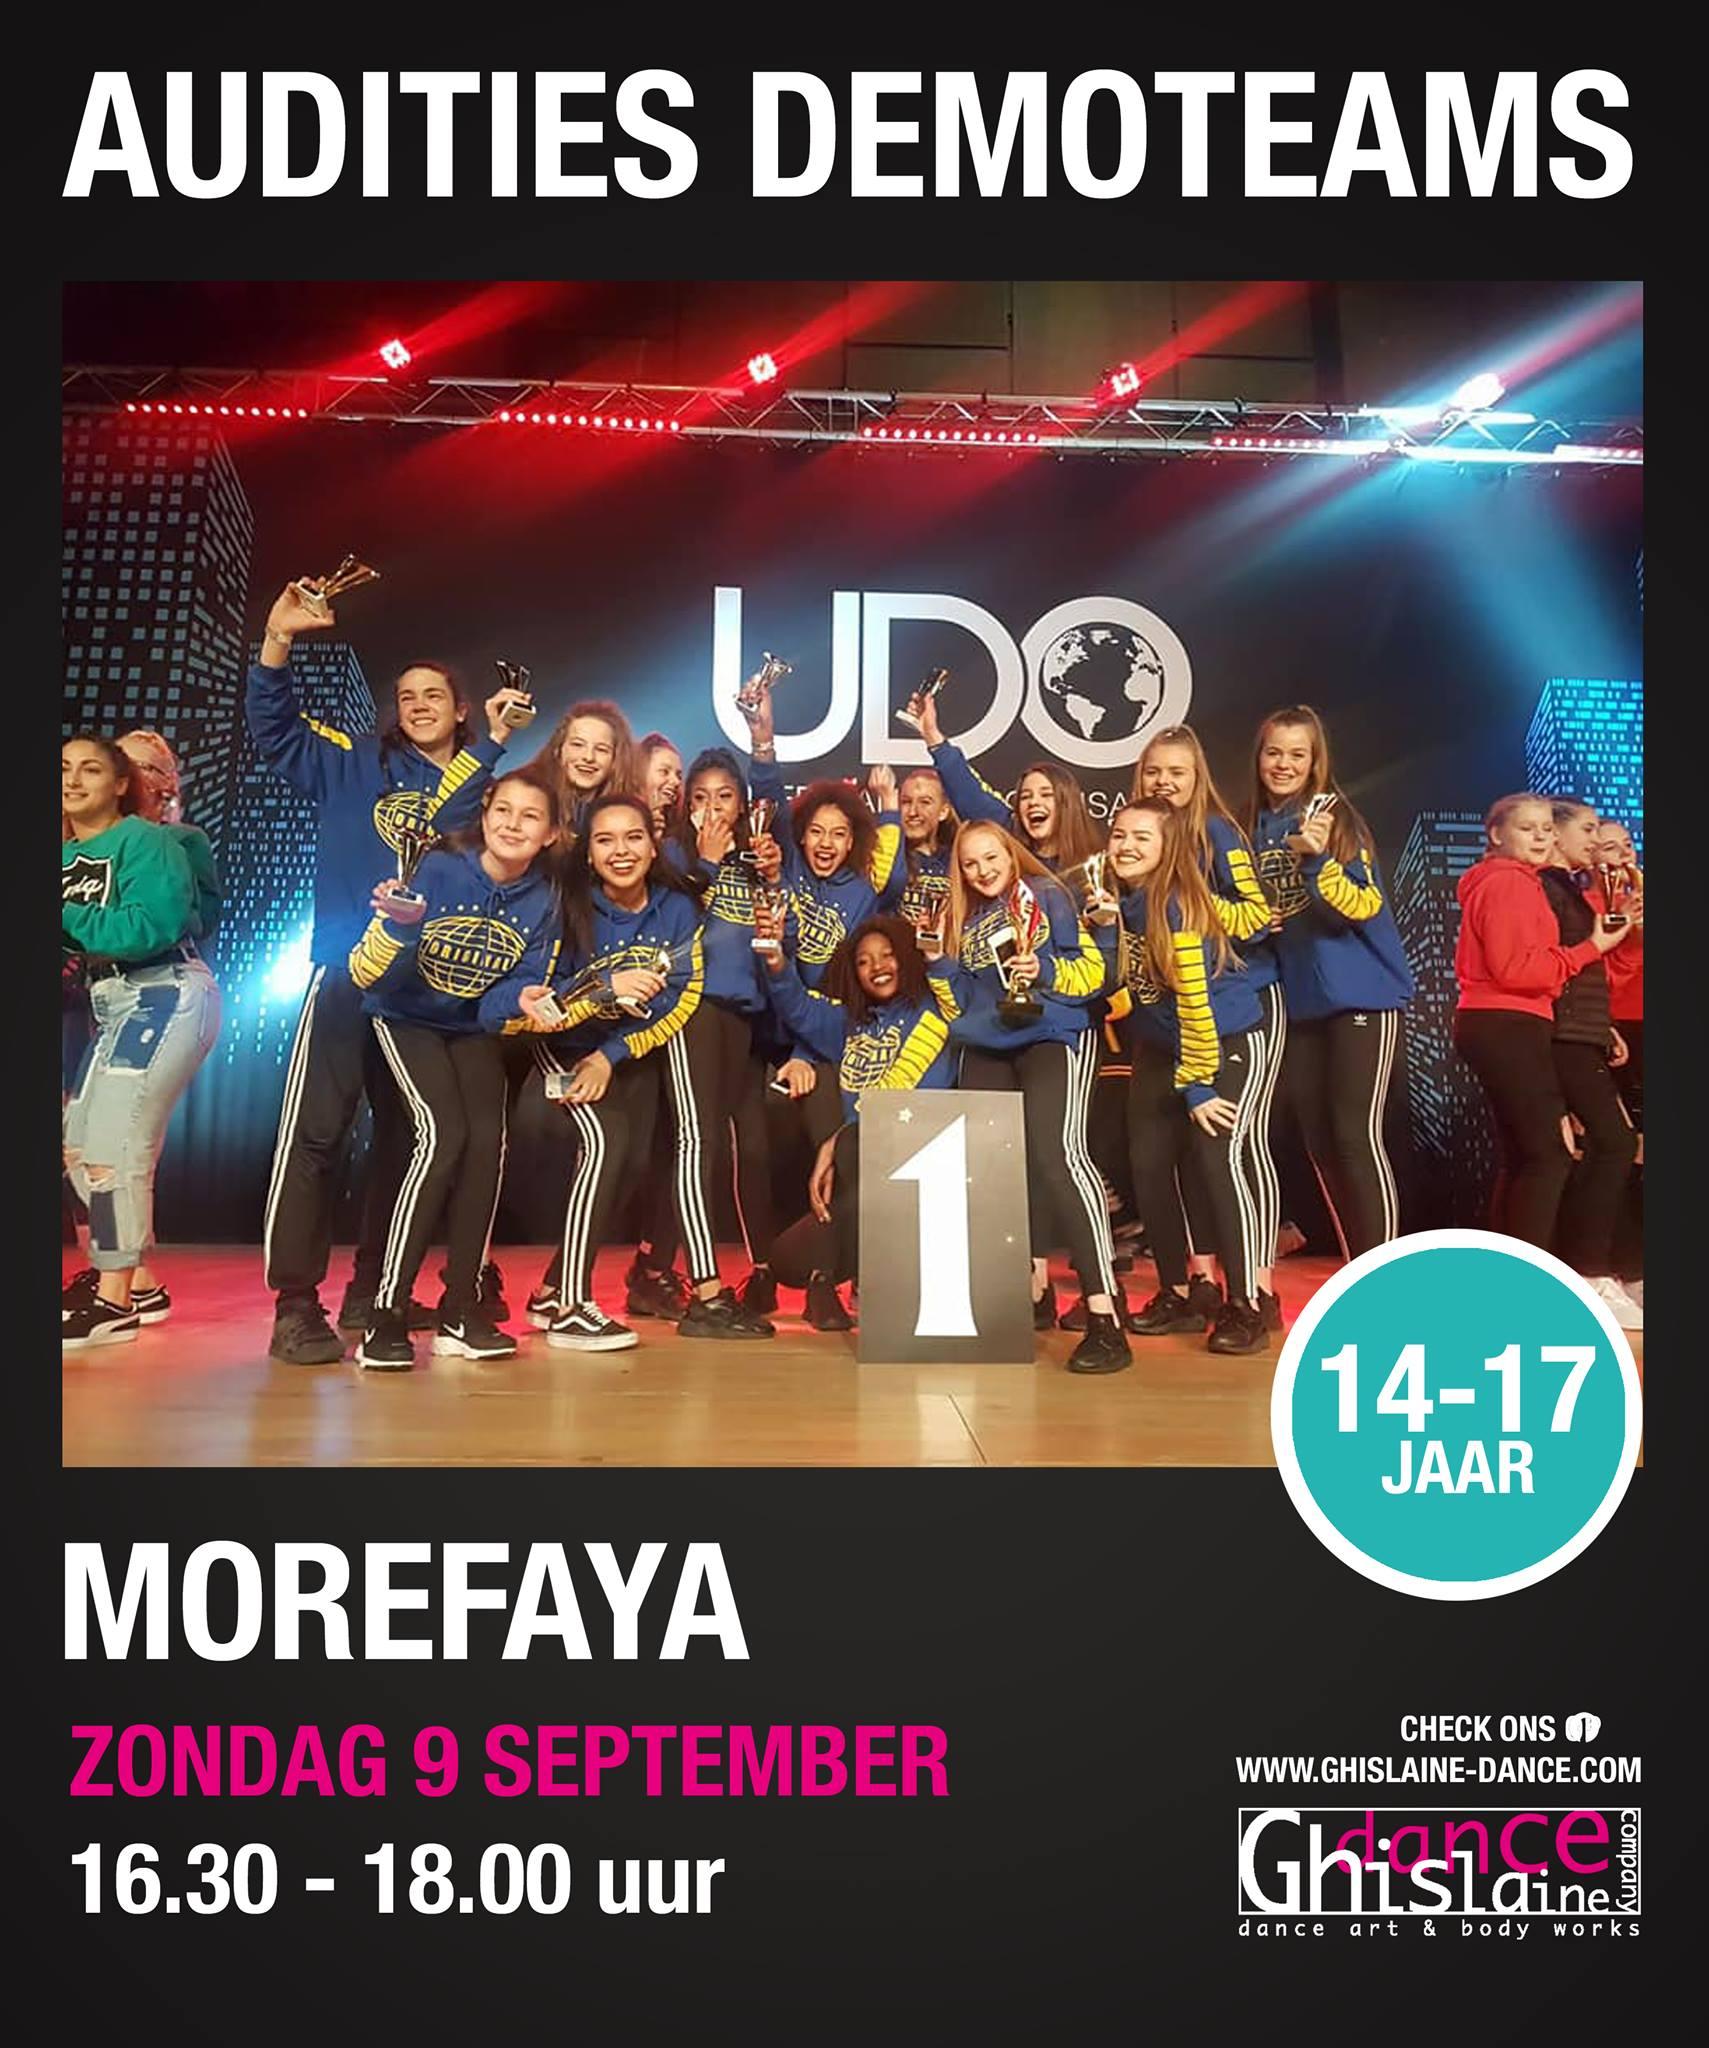 Auditie demoteam Morefaya Ghislaine Dance Company